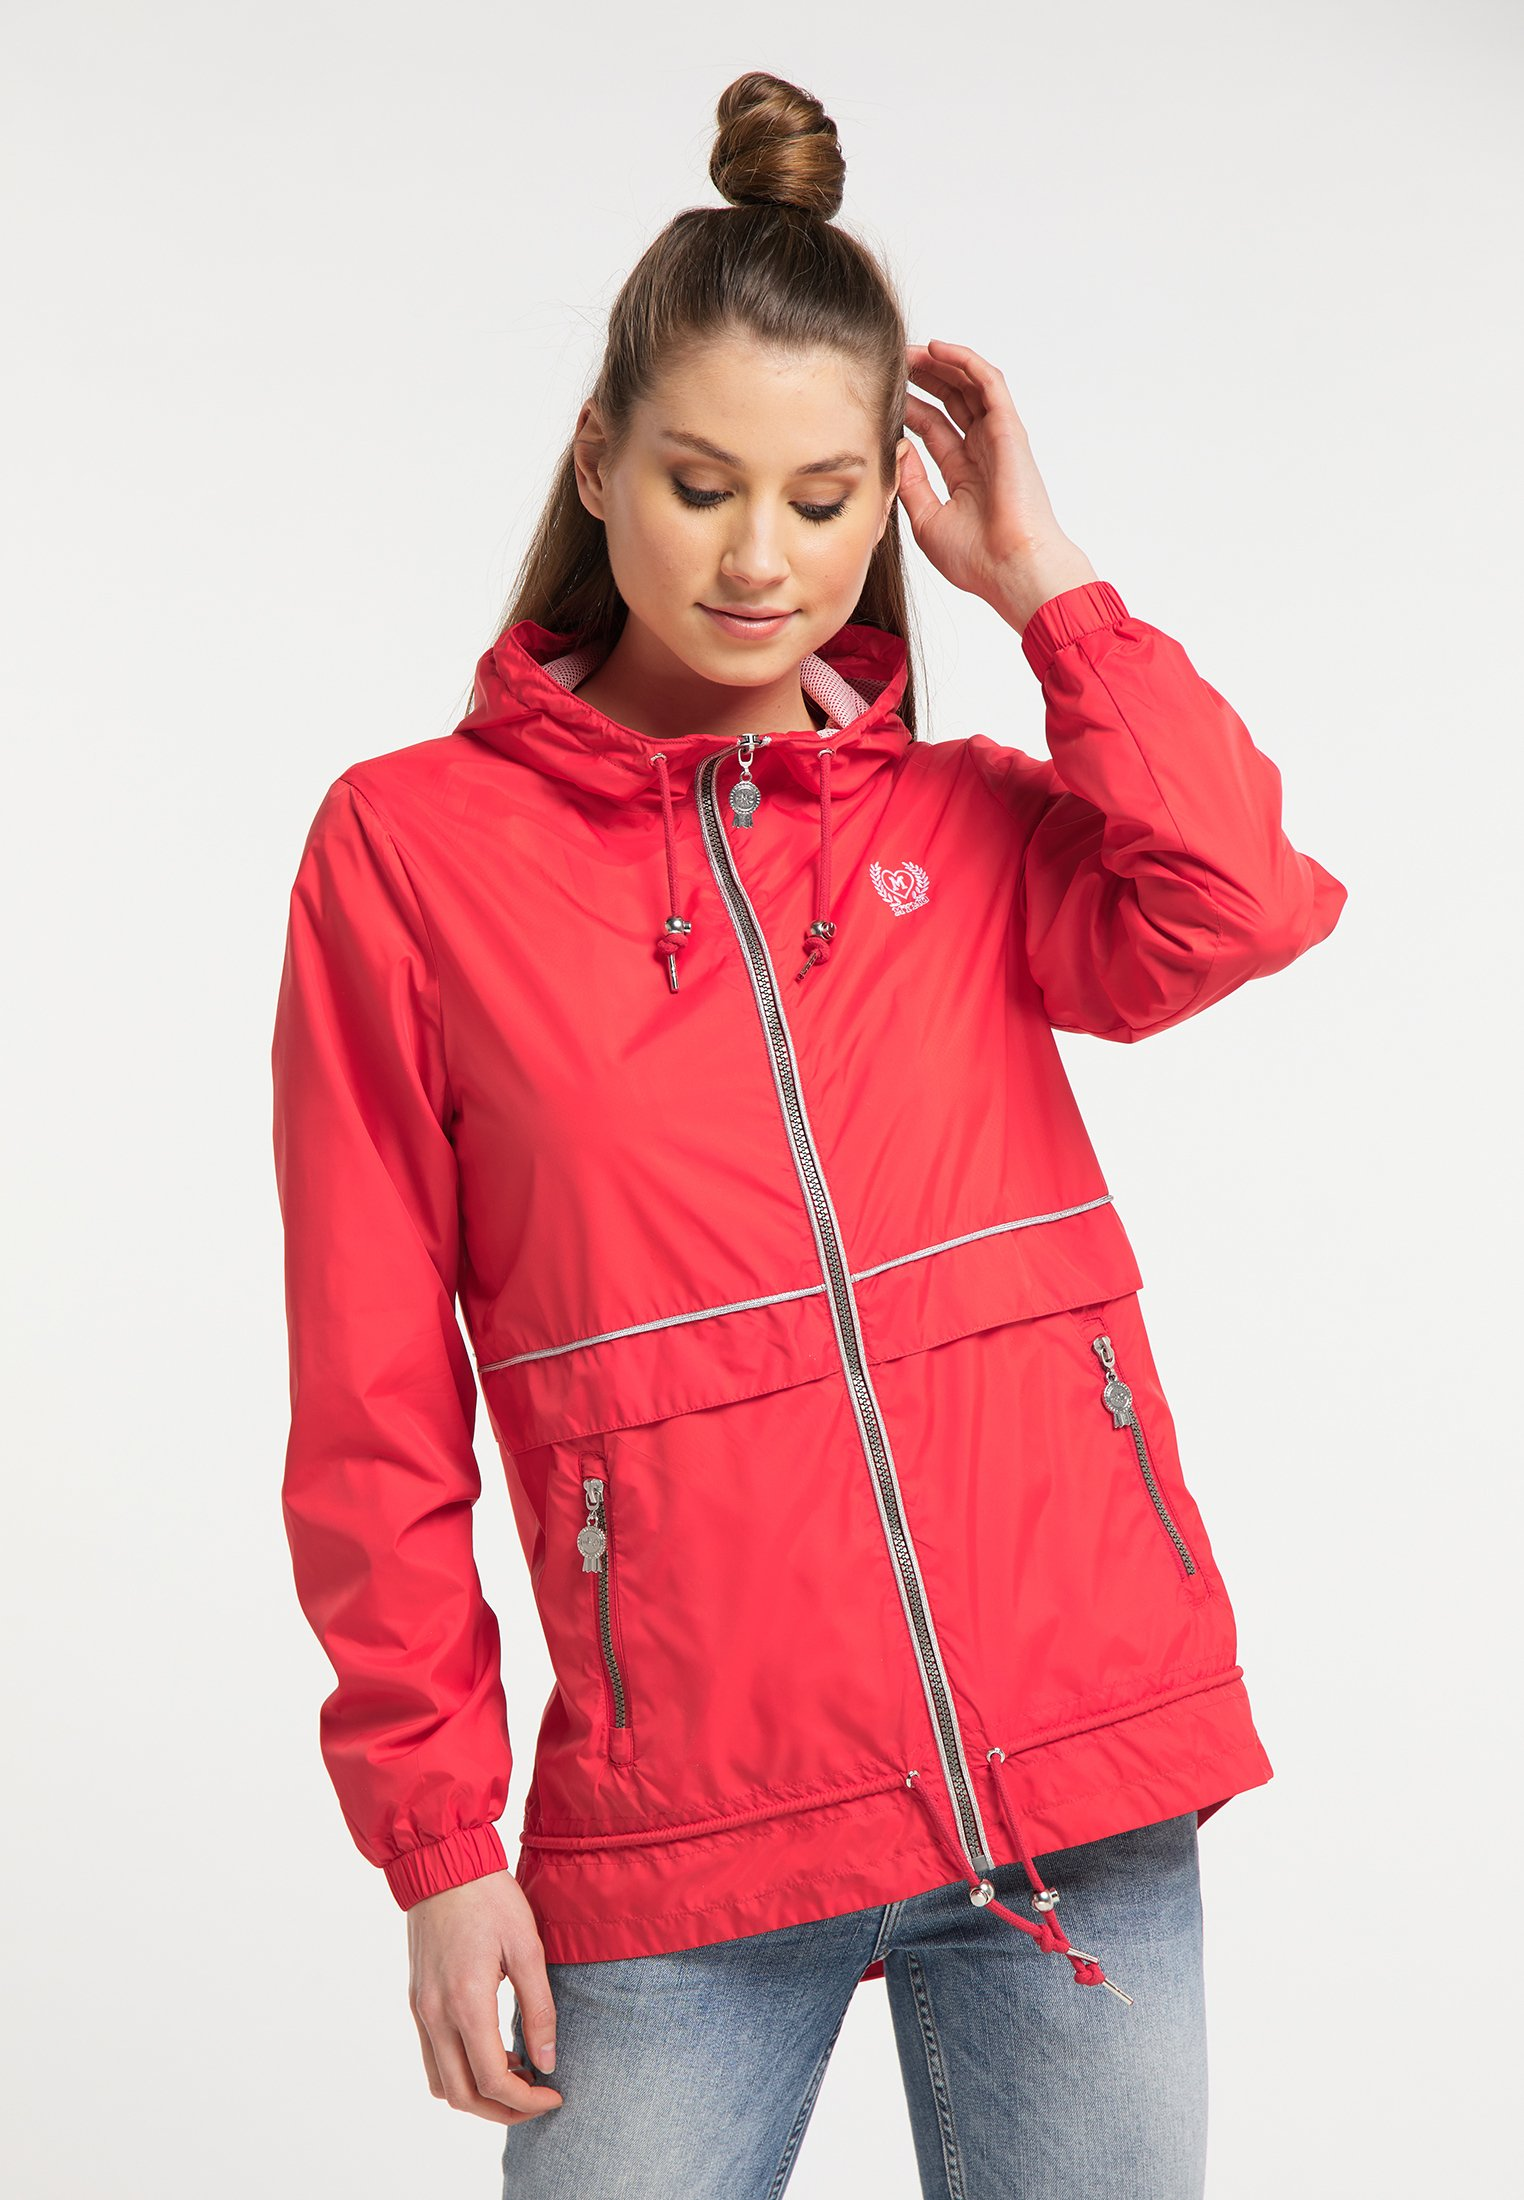 Affordable Women's Clothing myMo Summer jacket red g1uVtXxwJ